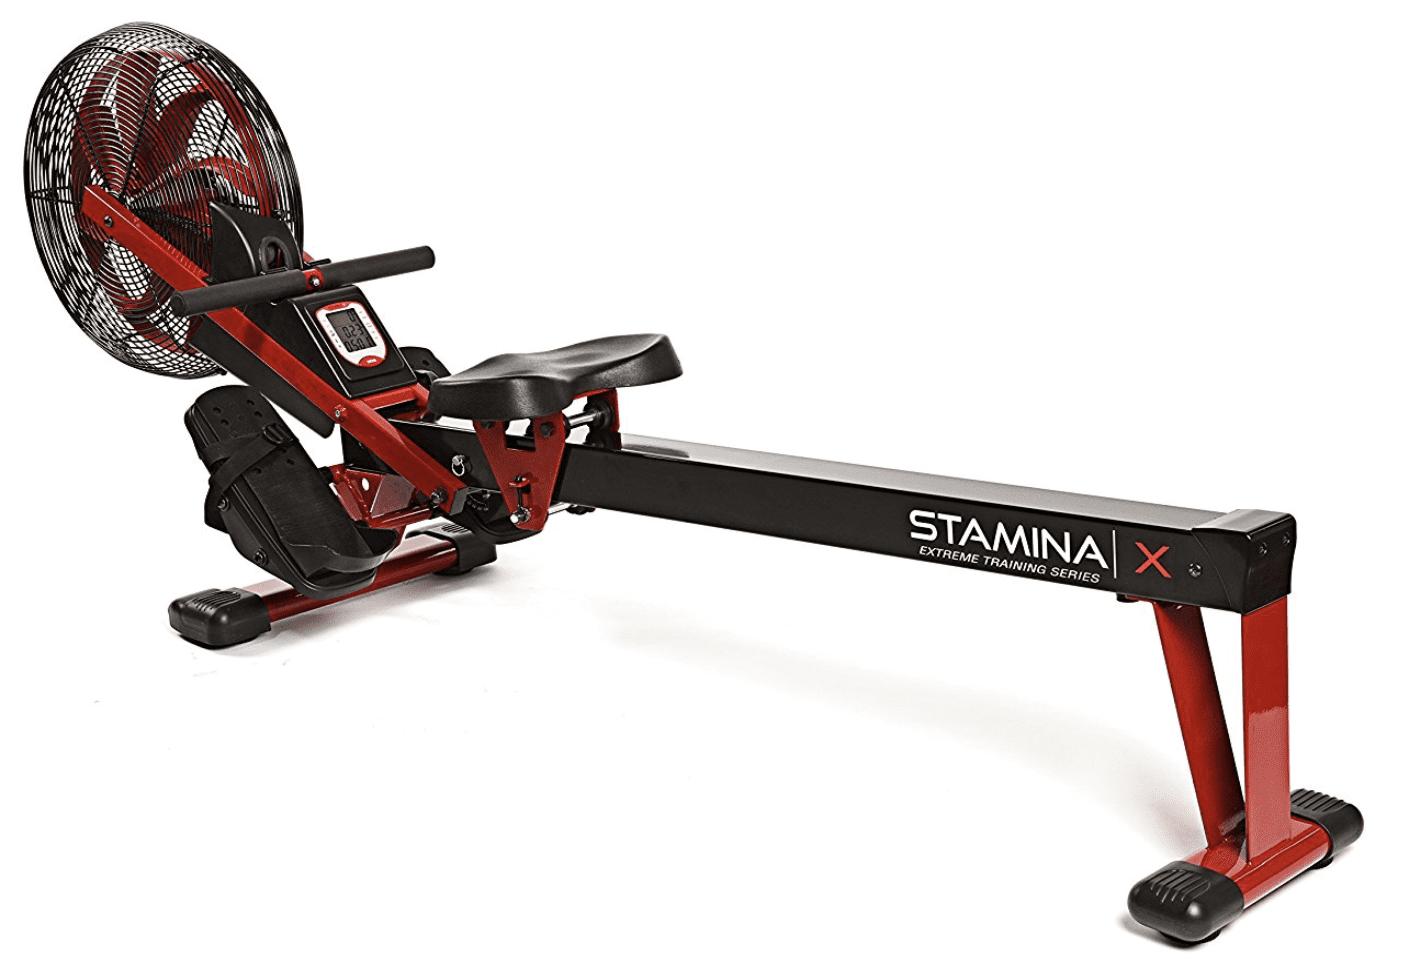 Stamina X Air Rower